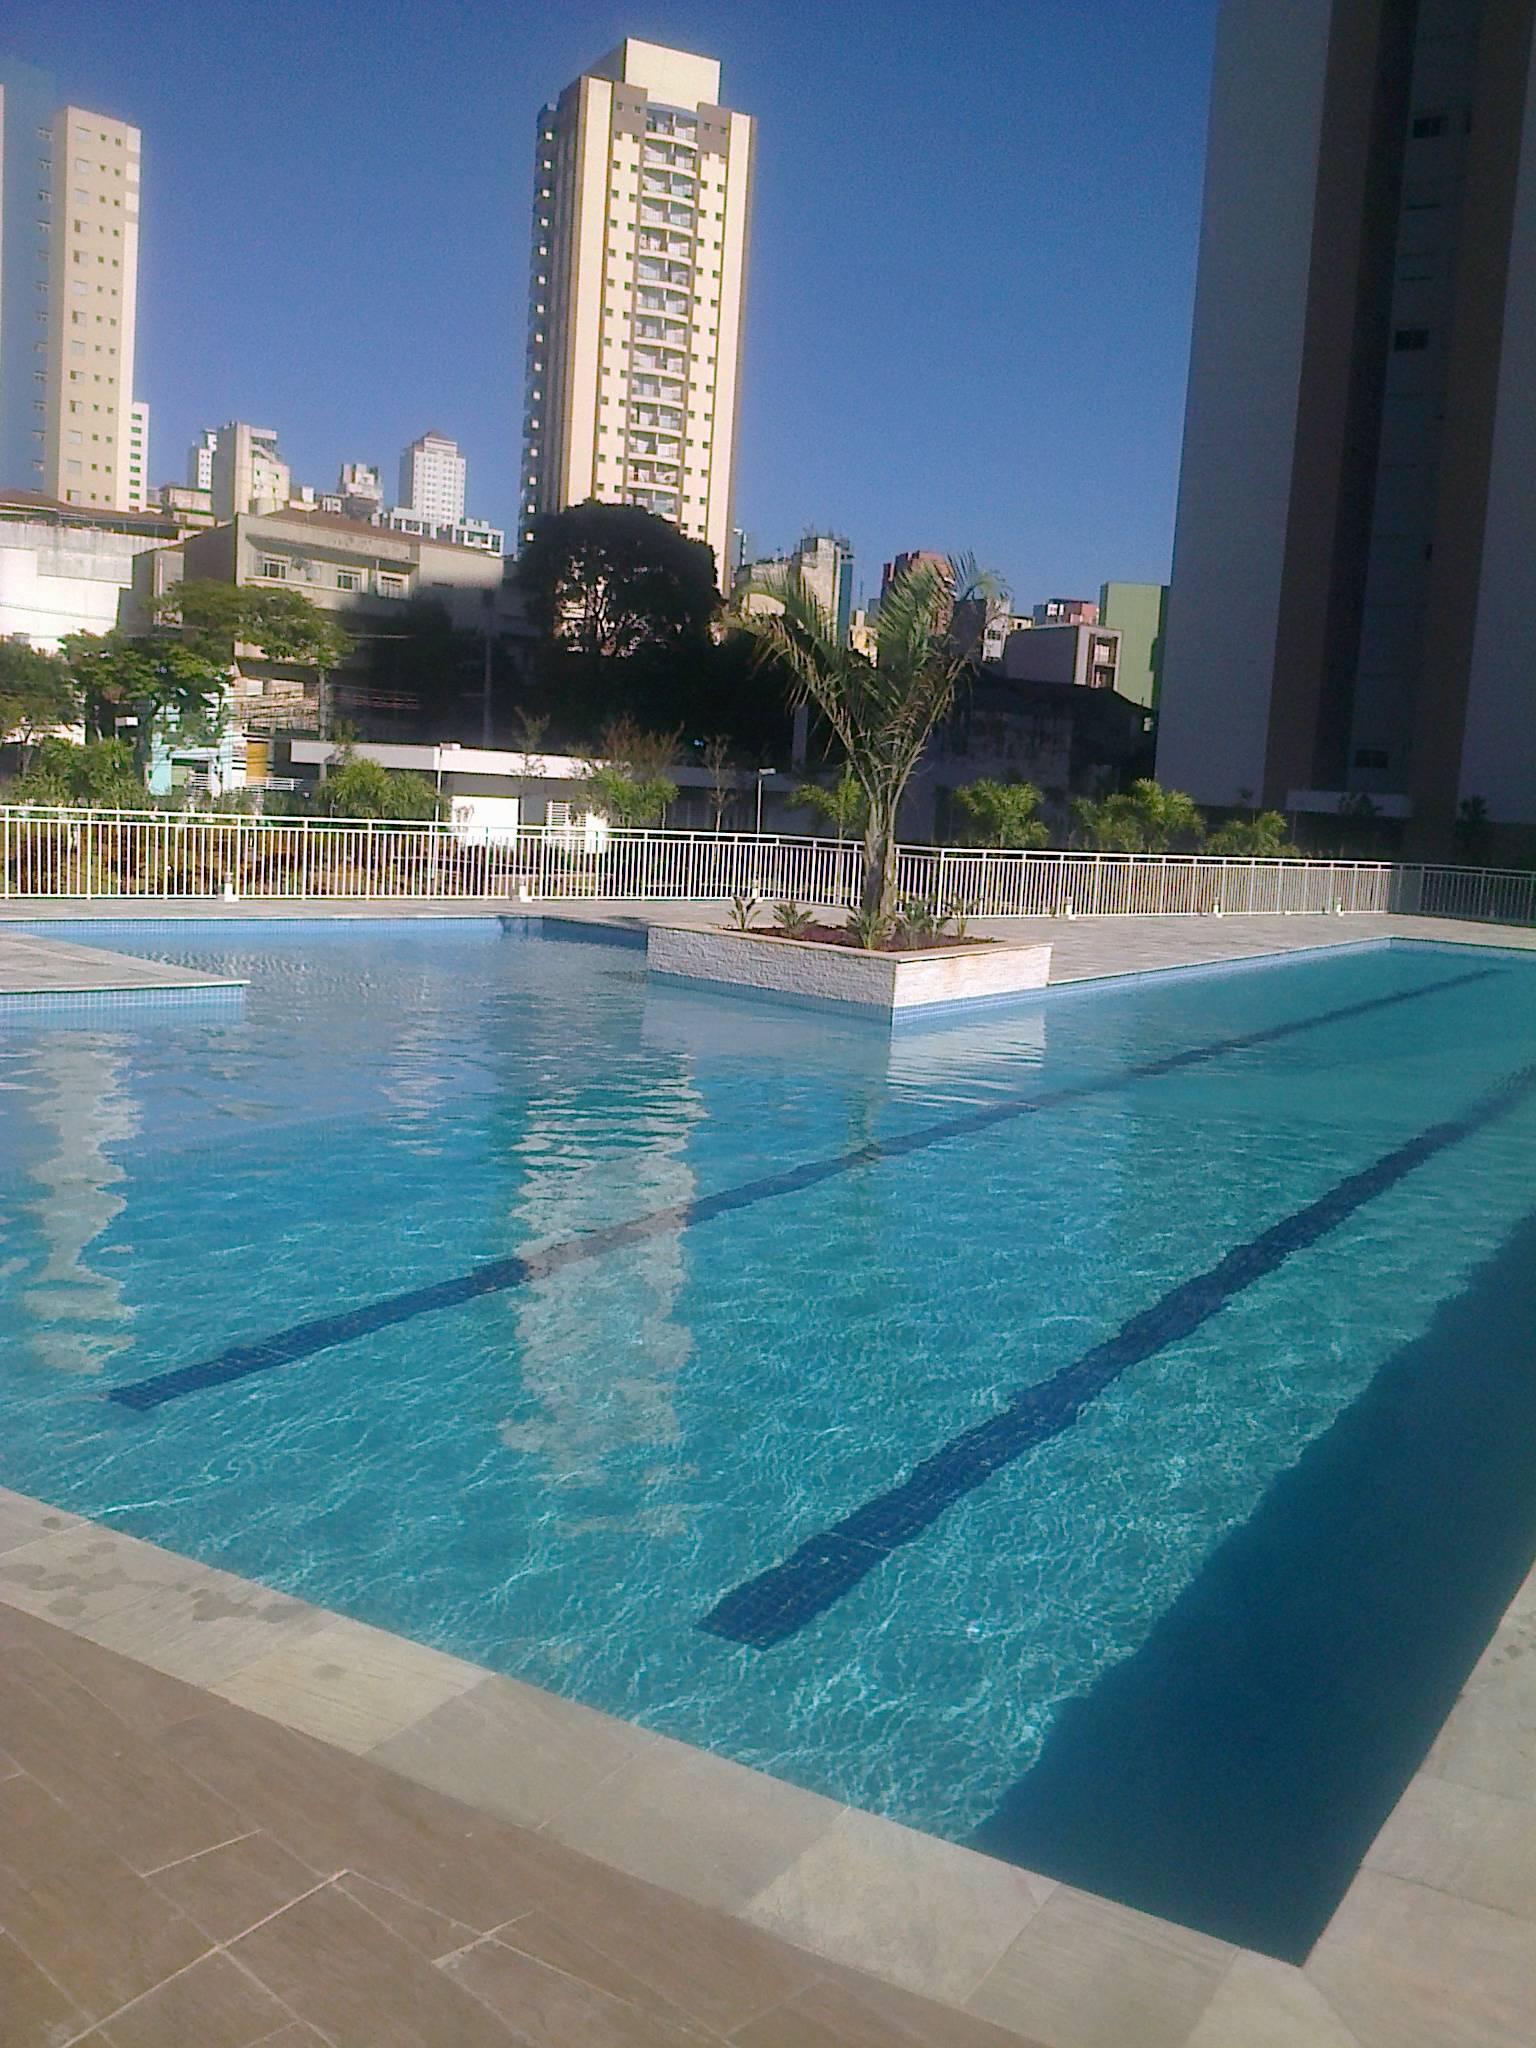 Empresa Especializada em Limpeza de Piscina na Vila Antônio - Empresa para Limpar Piscina